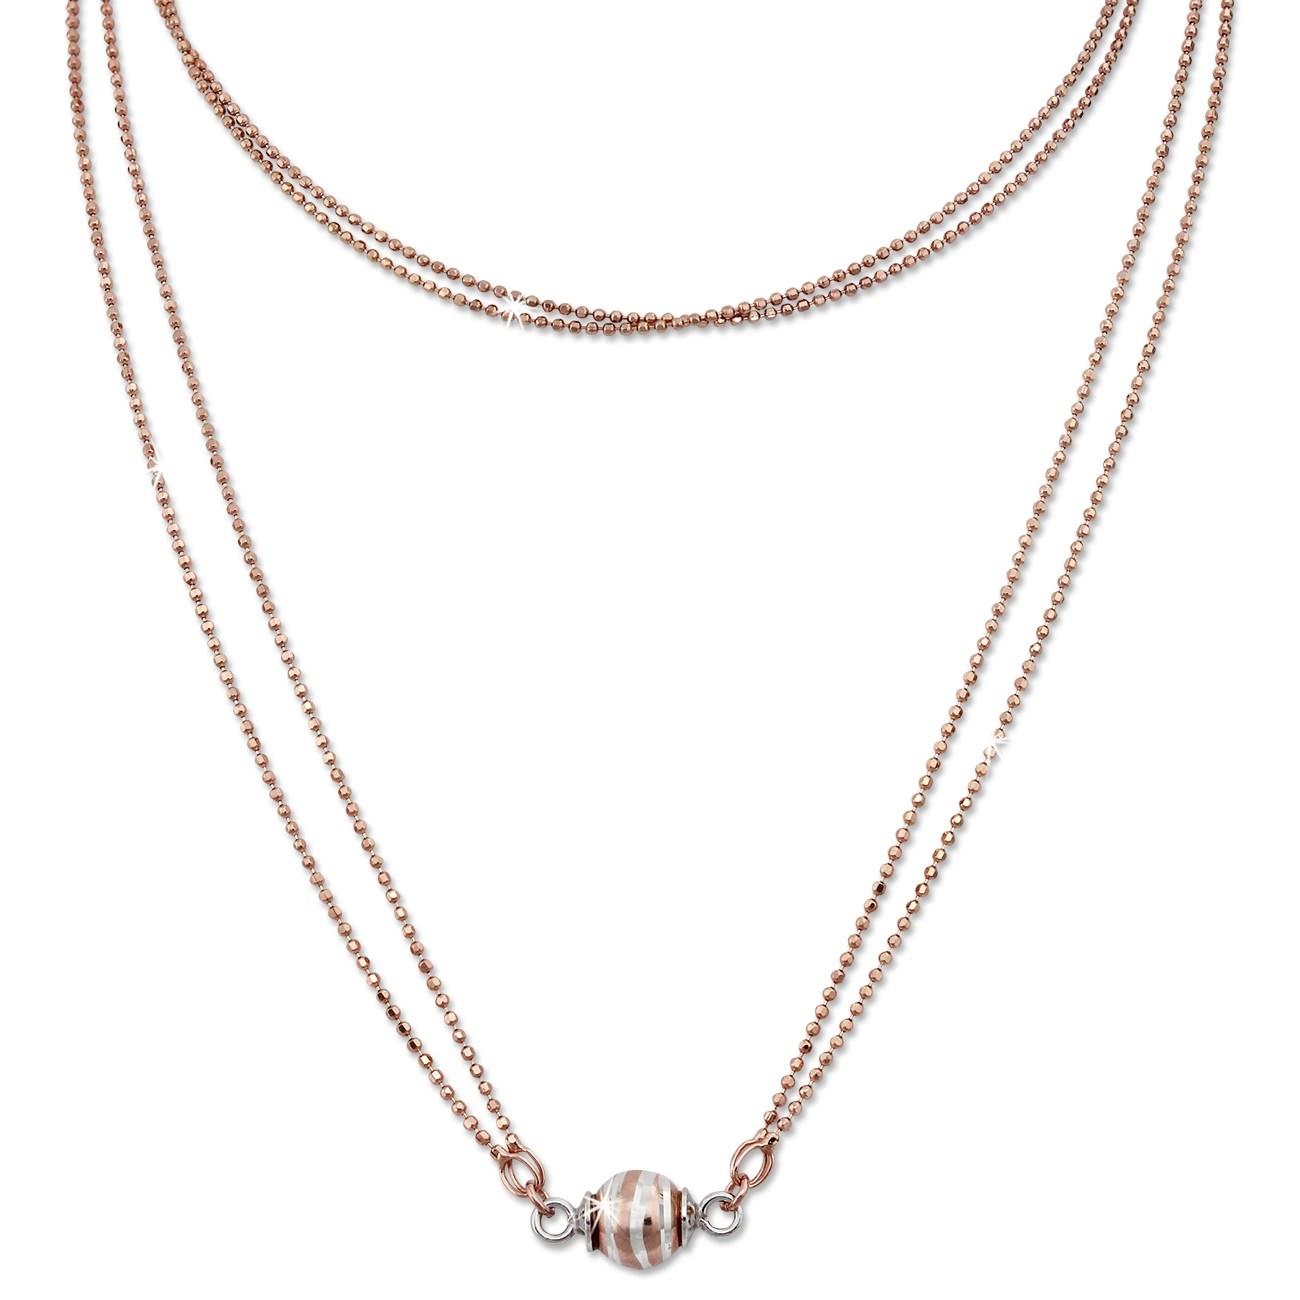 SilberDream Collier Kette Kugel Welle rose 925 Silber Damen 45cm SDK24745E